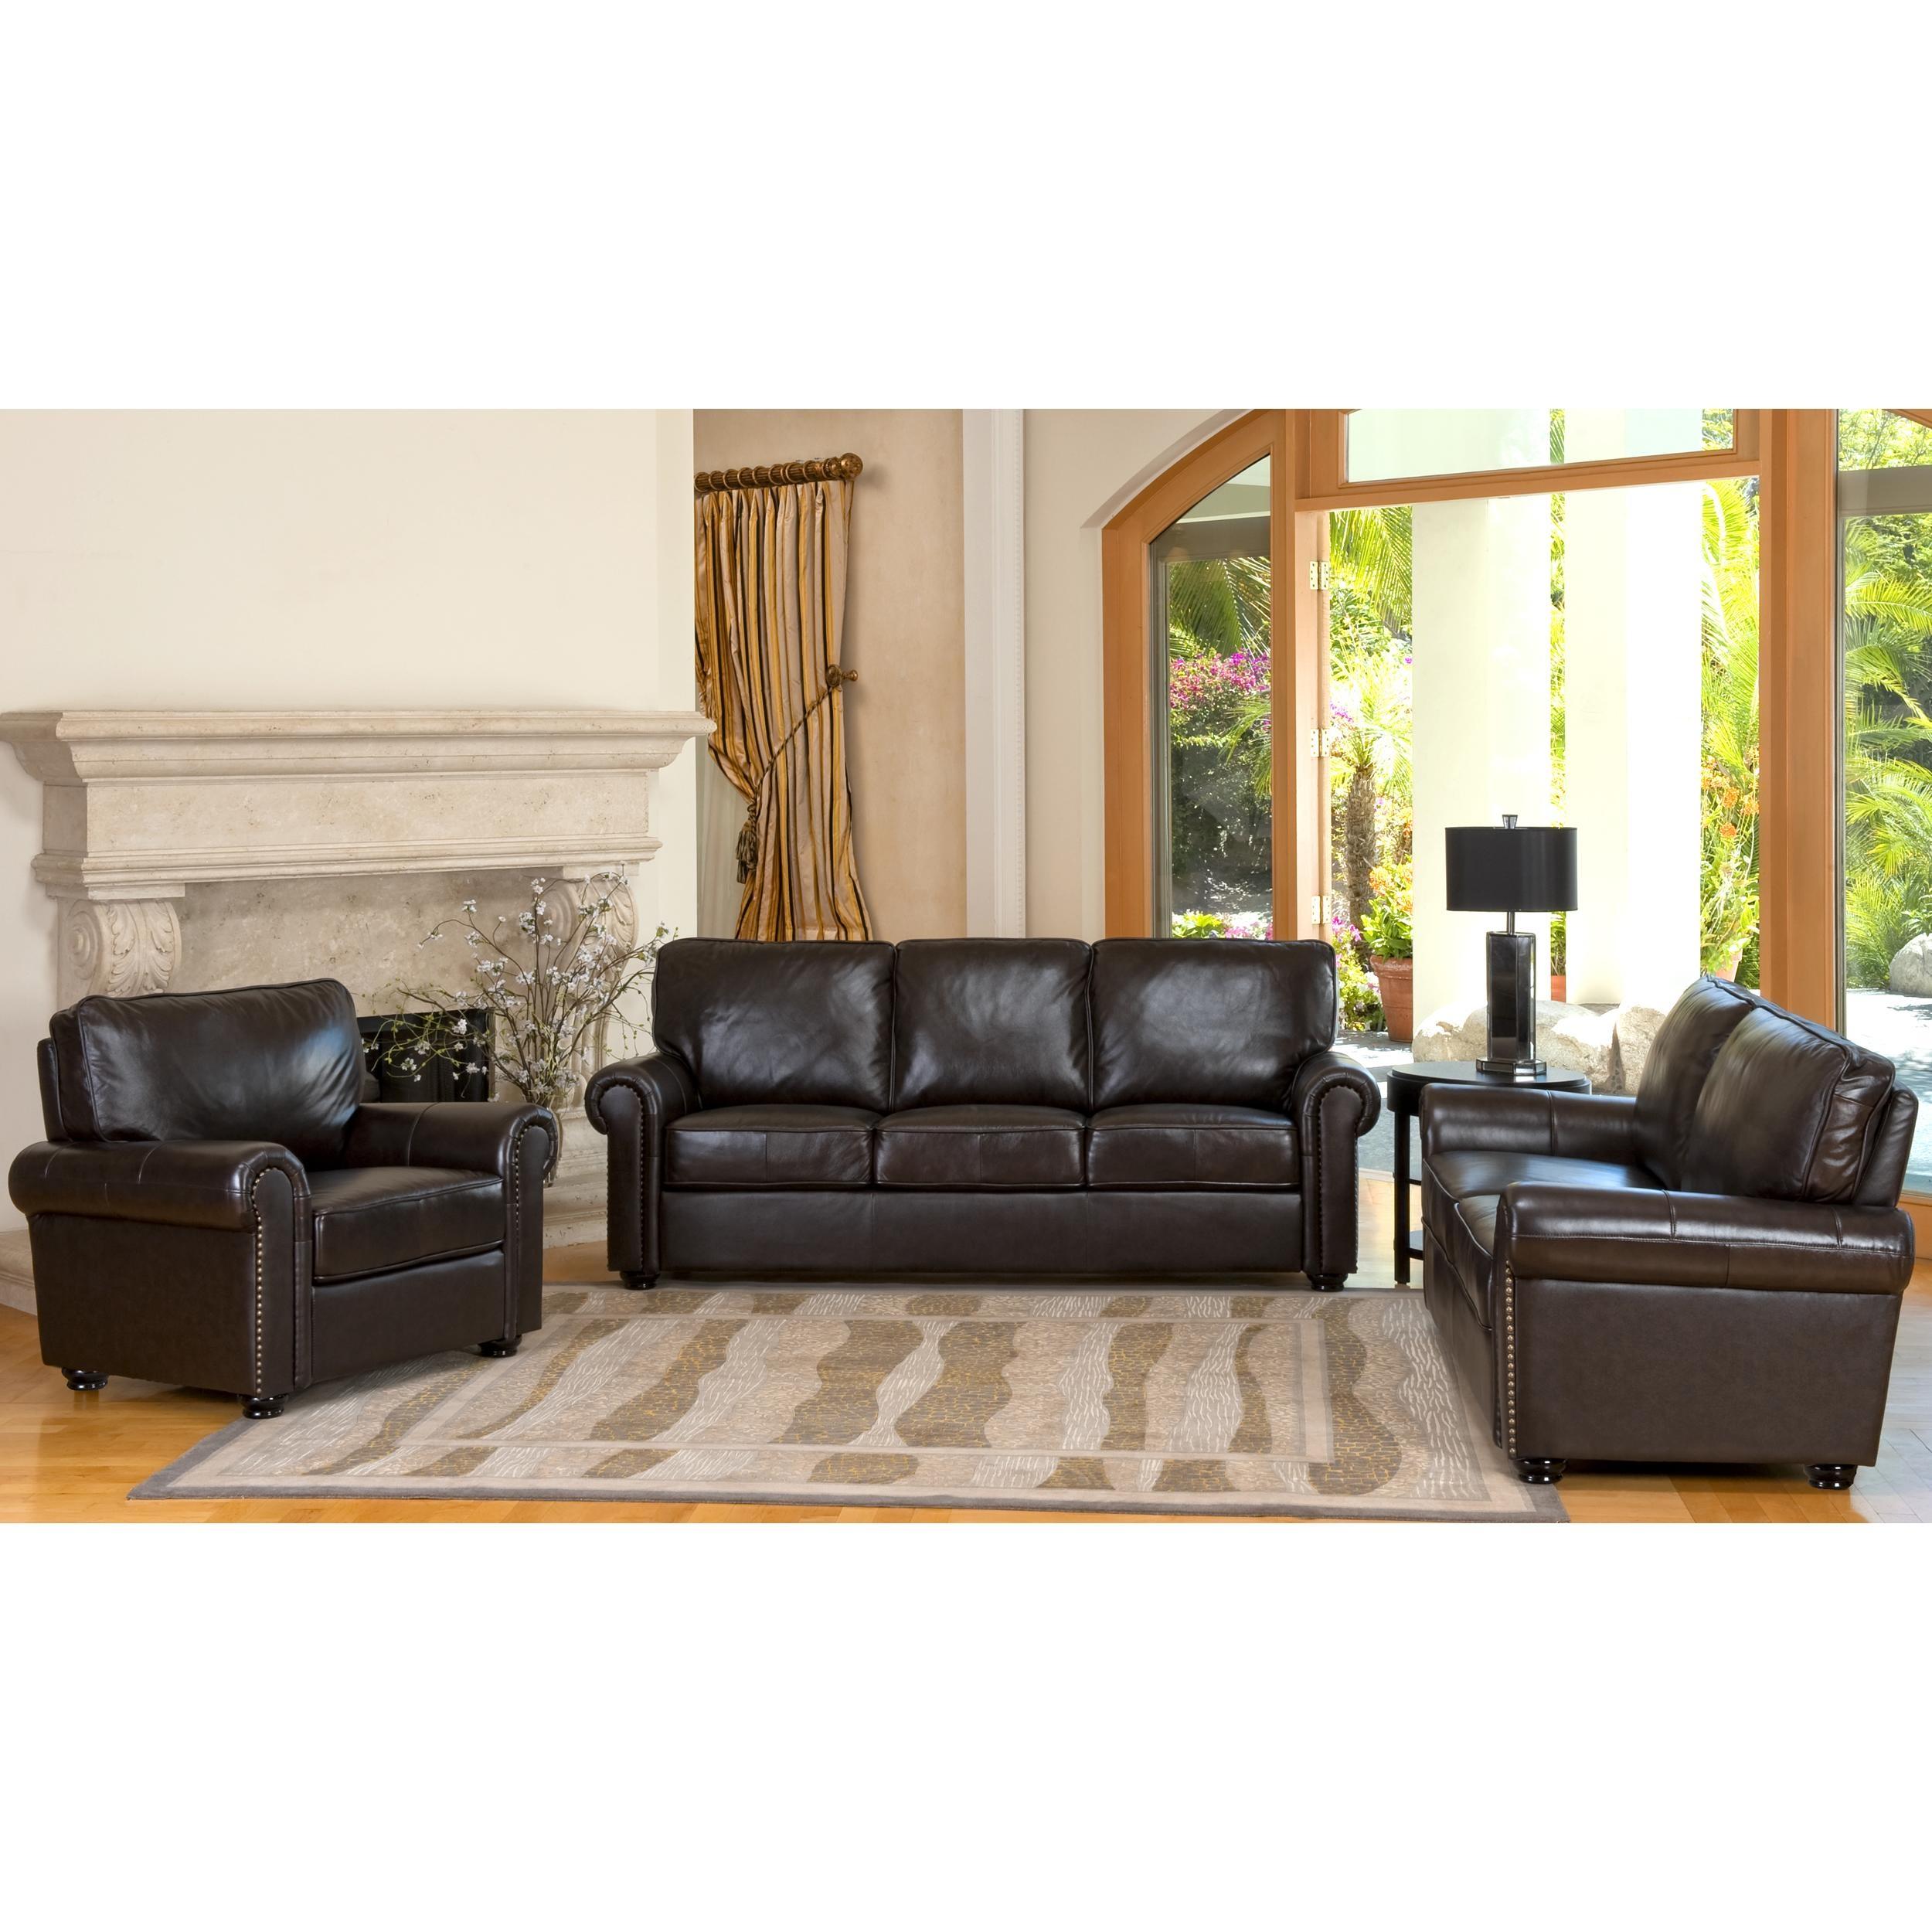 Sofas Center : 42 Excellent Abbyson Living Sofa Photo Concept Pertaining To Abbyson Living Sofas (View 9 of 20)